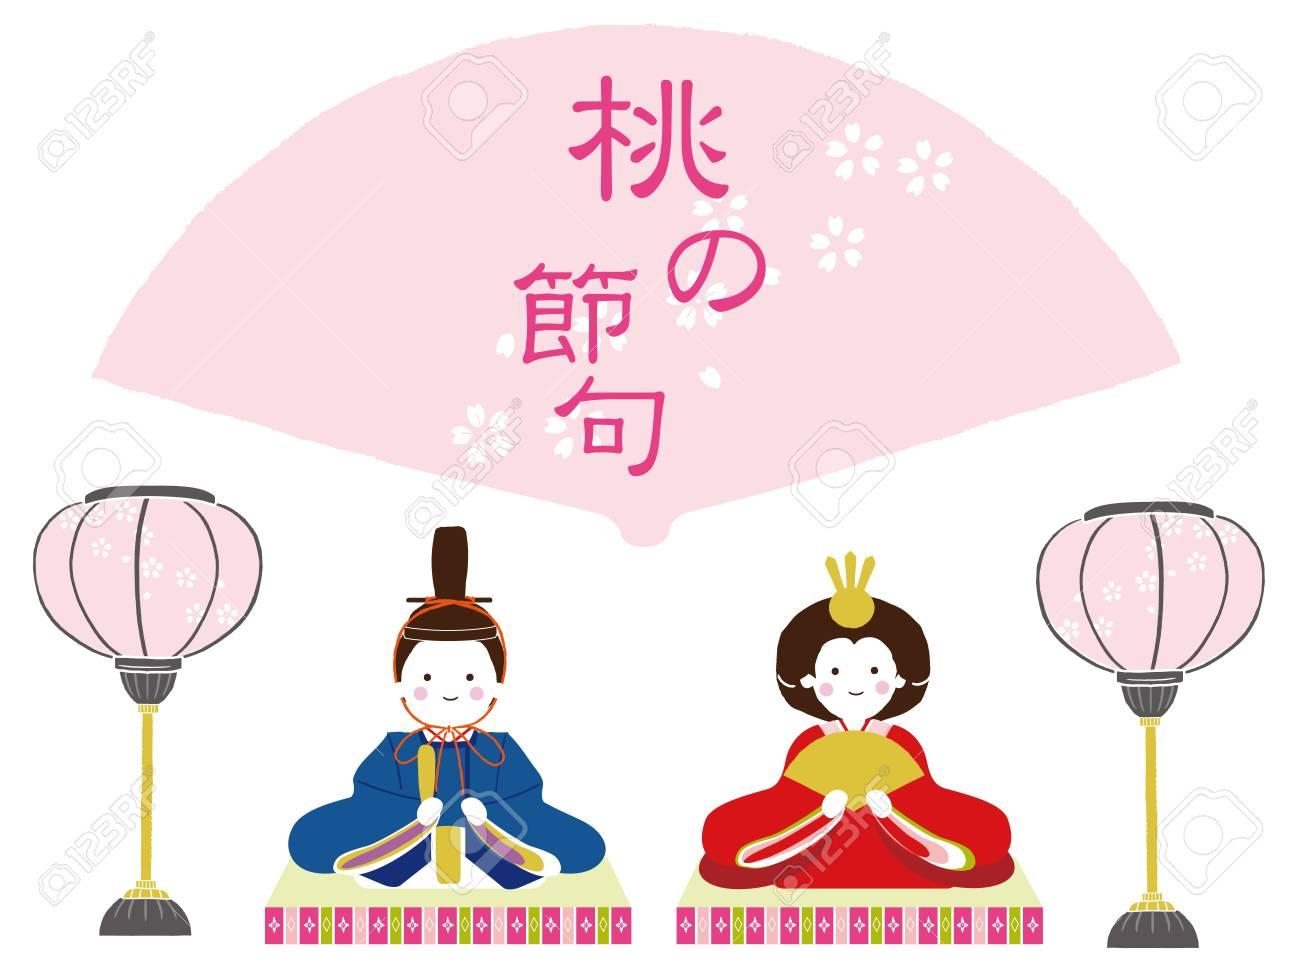 3 japanese girls